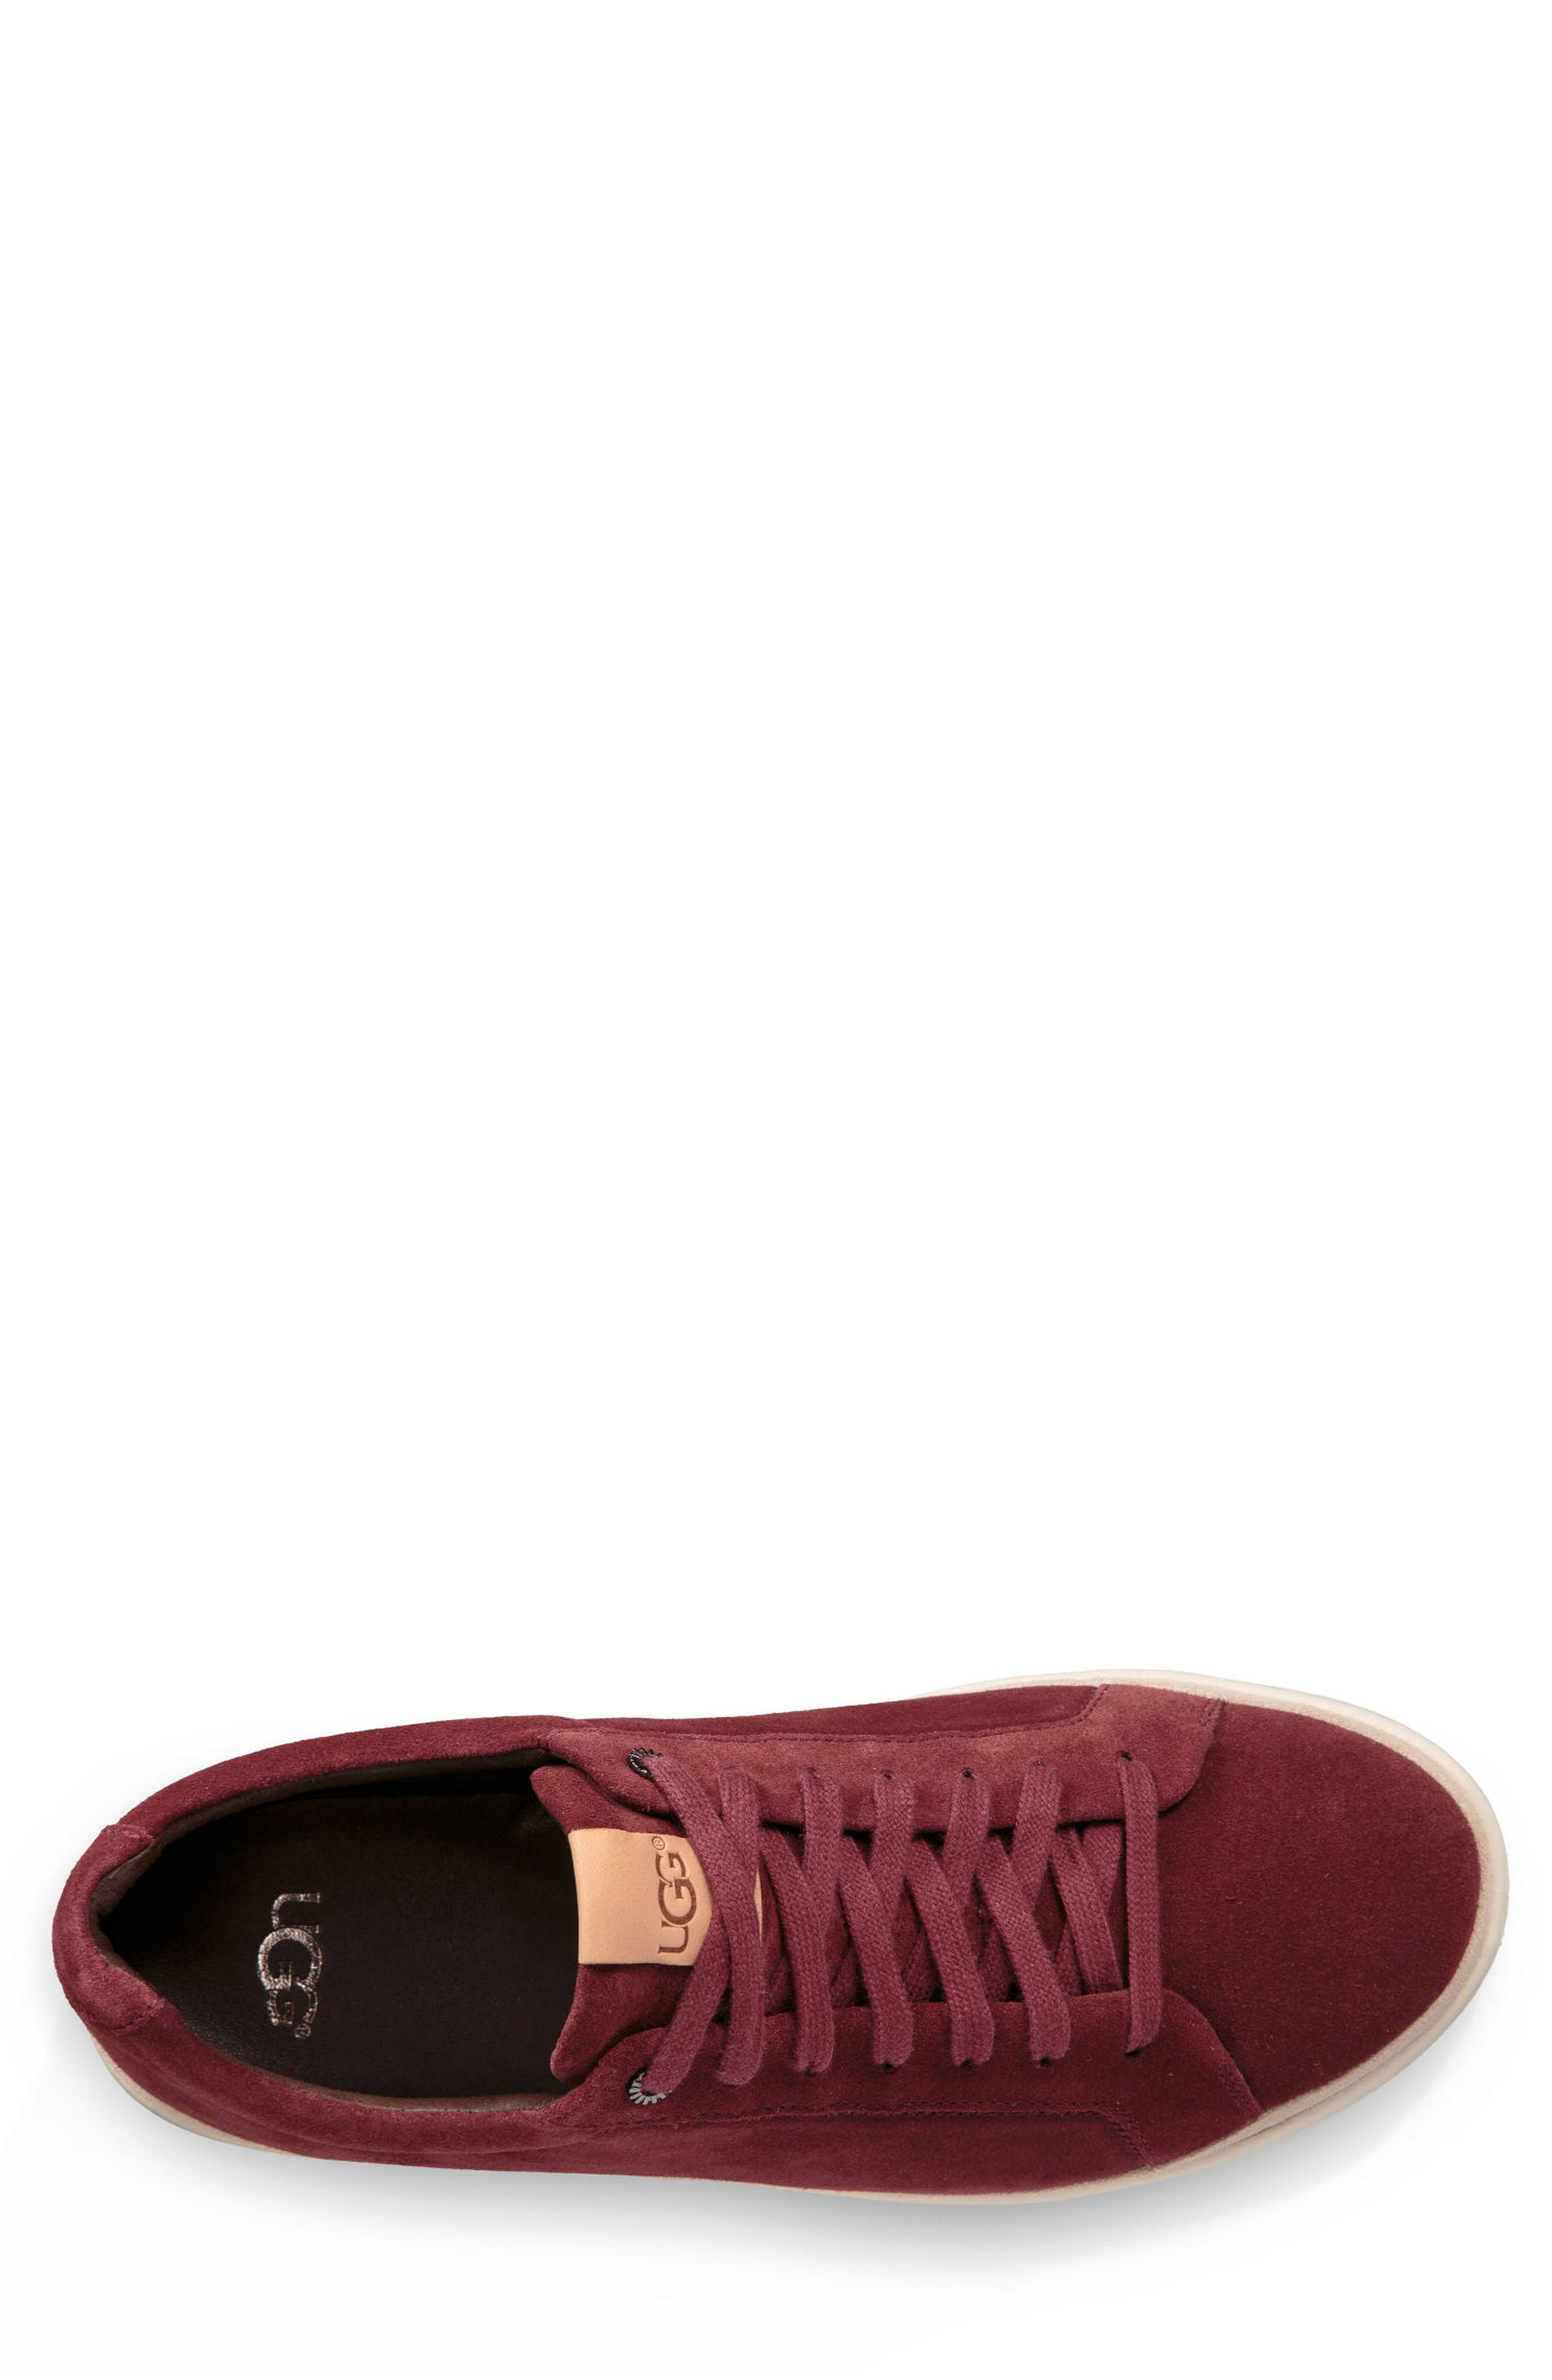 Brecken Sneaker,                             Alternate thumbnail 3, color,                             Pinot Noir Leather